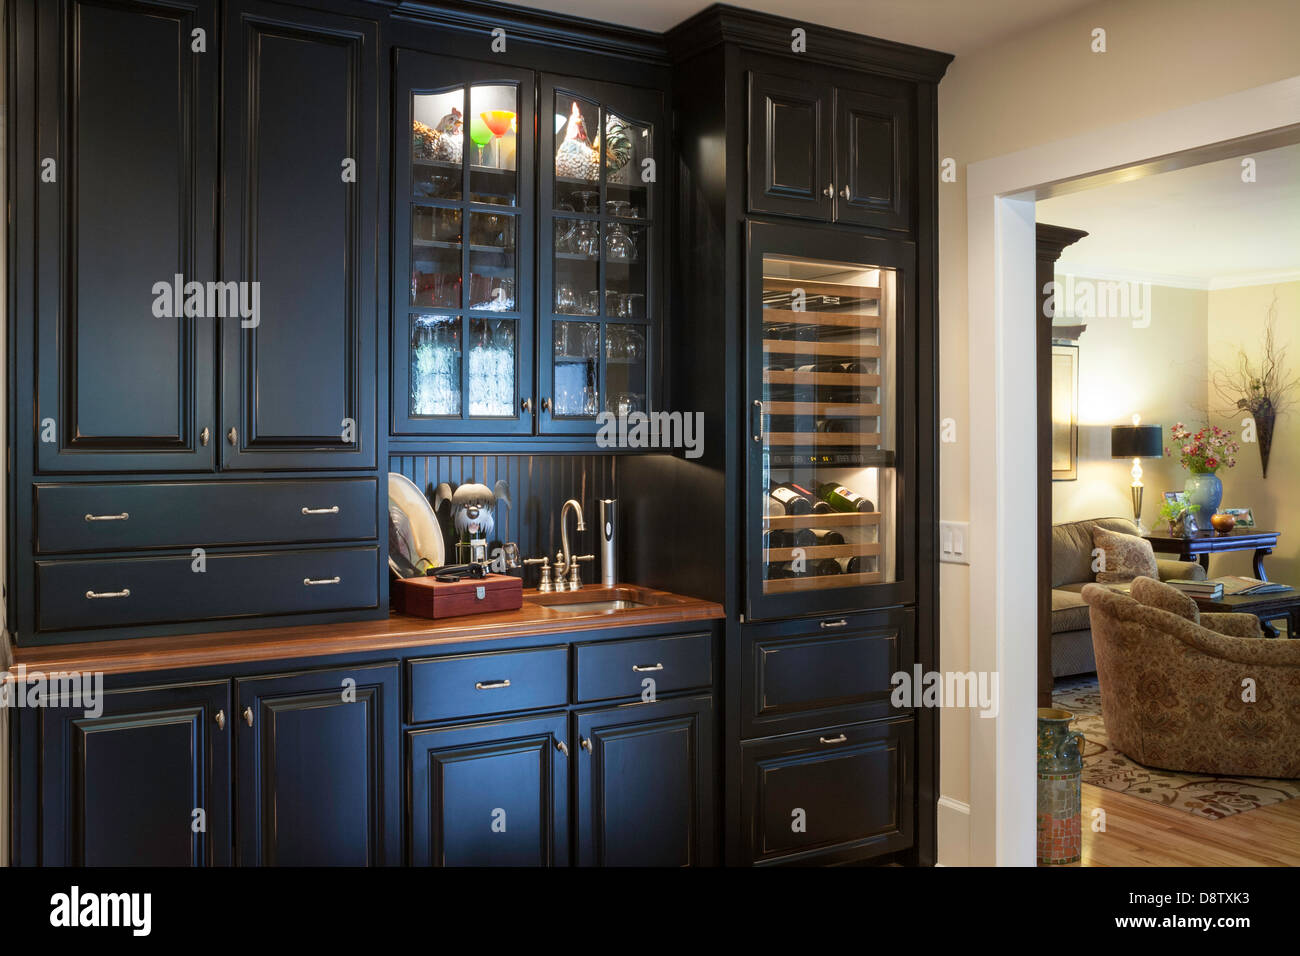 Luxury Home Interior Wet Bar Stockfotos & Luxury Home Interior Wet ...